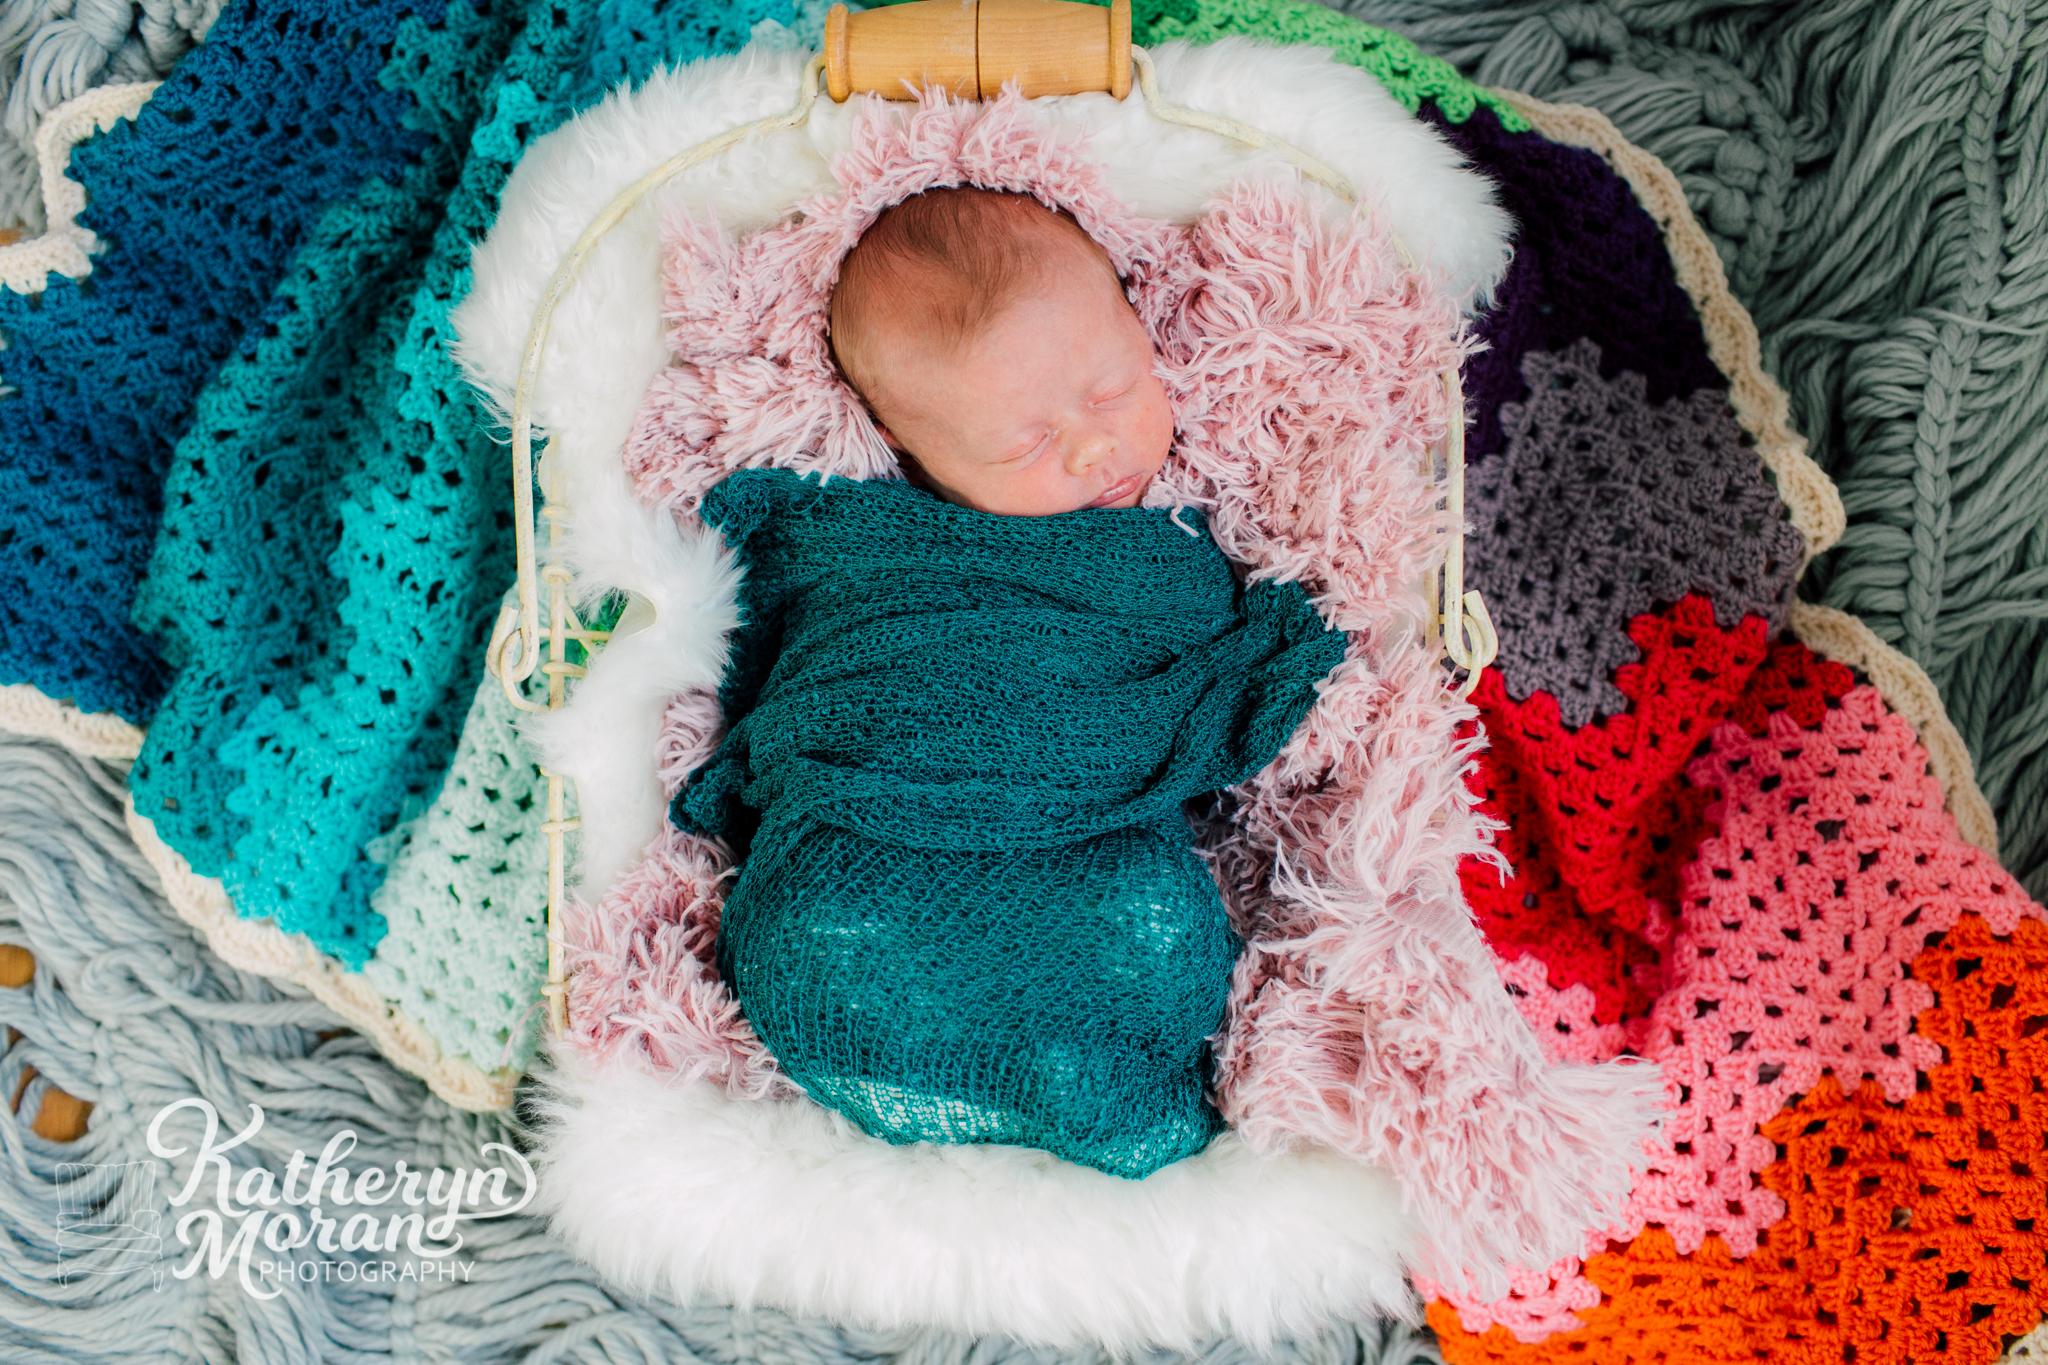 seattle-newborn-photographer-katheryn-moran-avery-malaspino-5.jpg